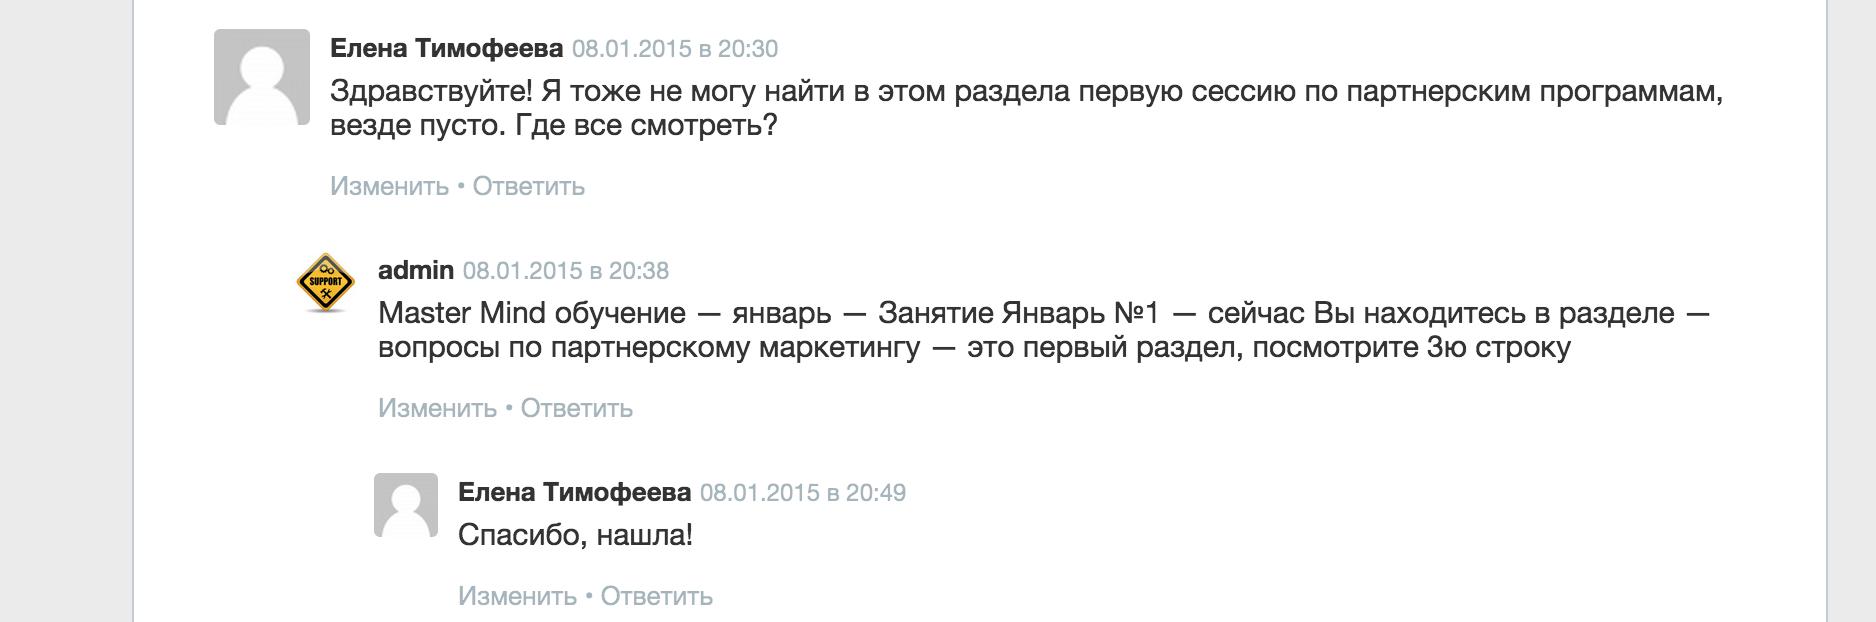 Снимок экрана 2015-03-05 в 13.12.28